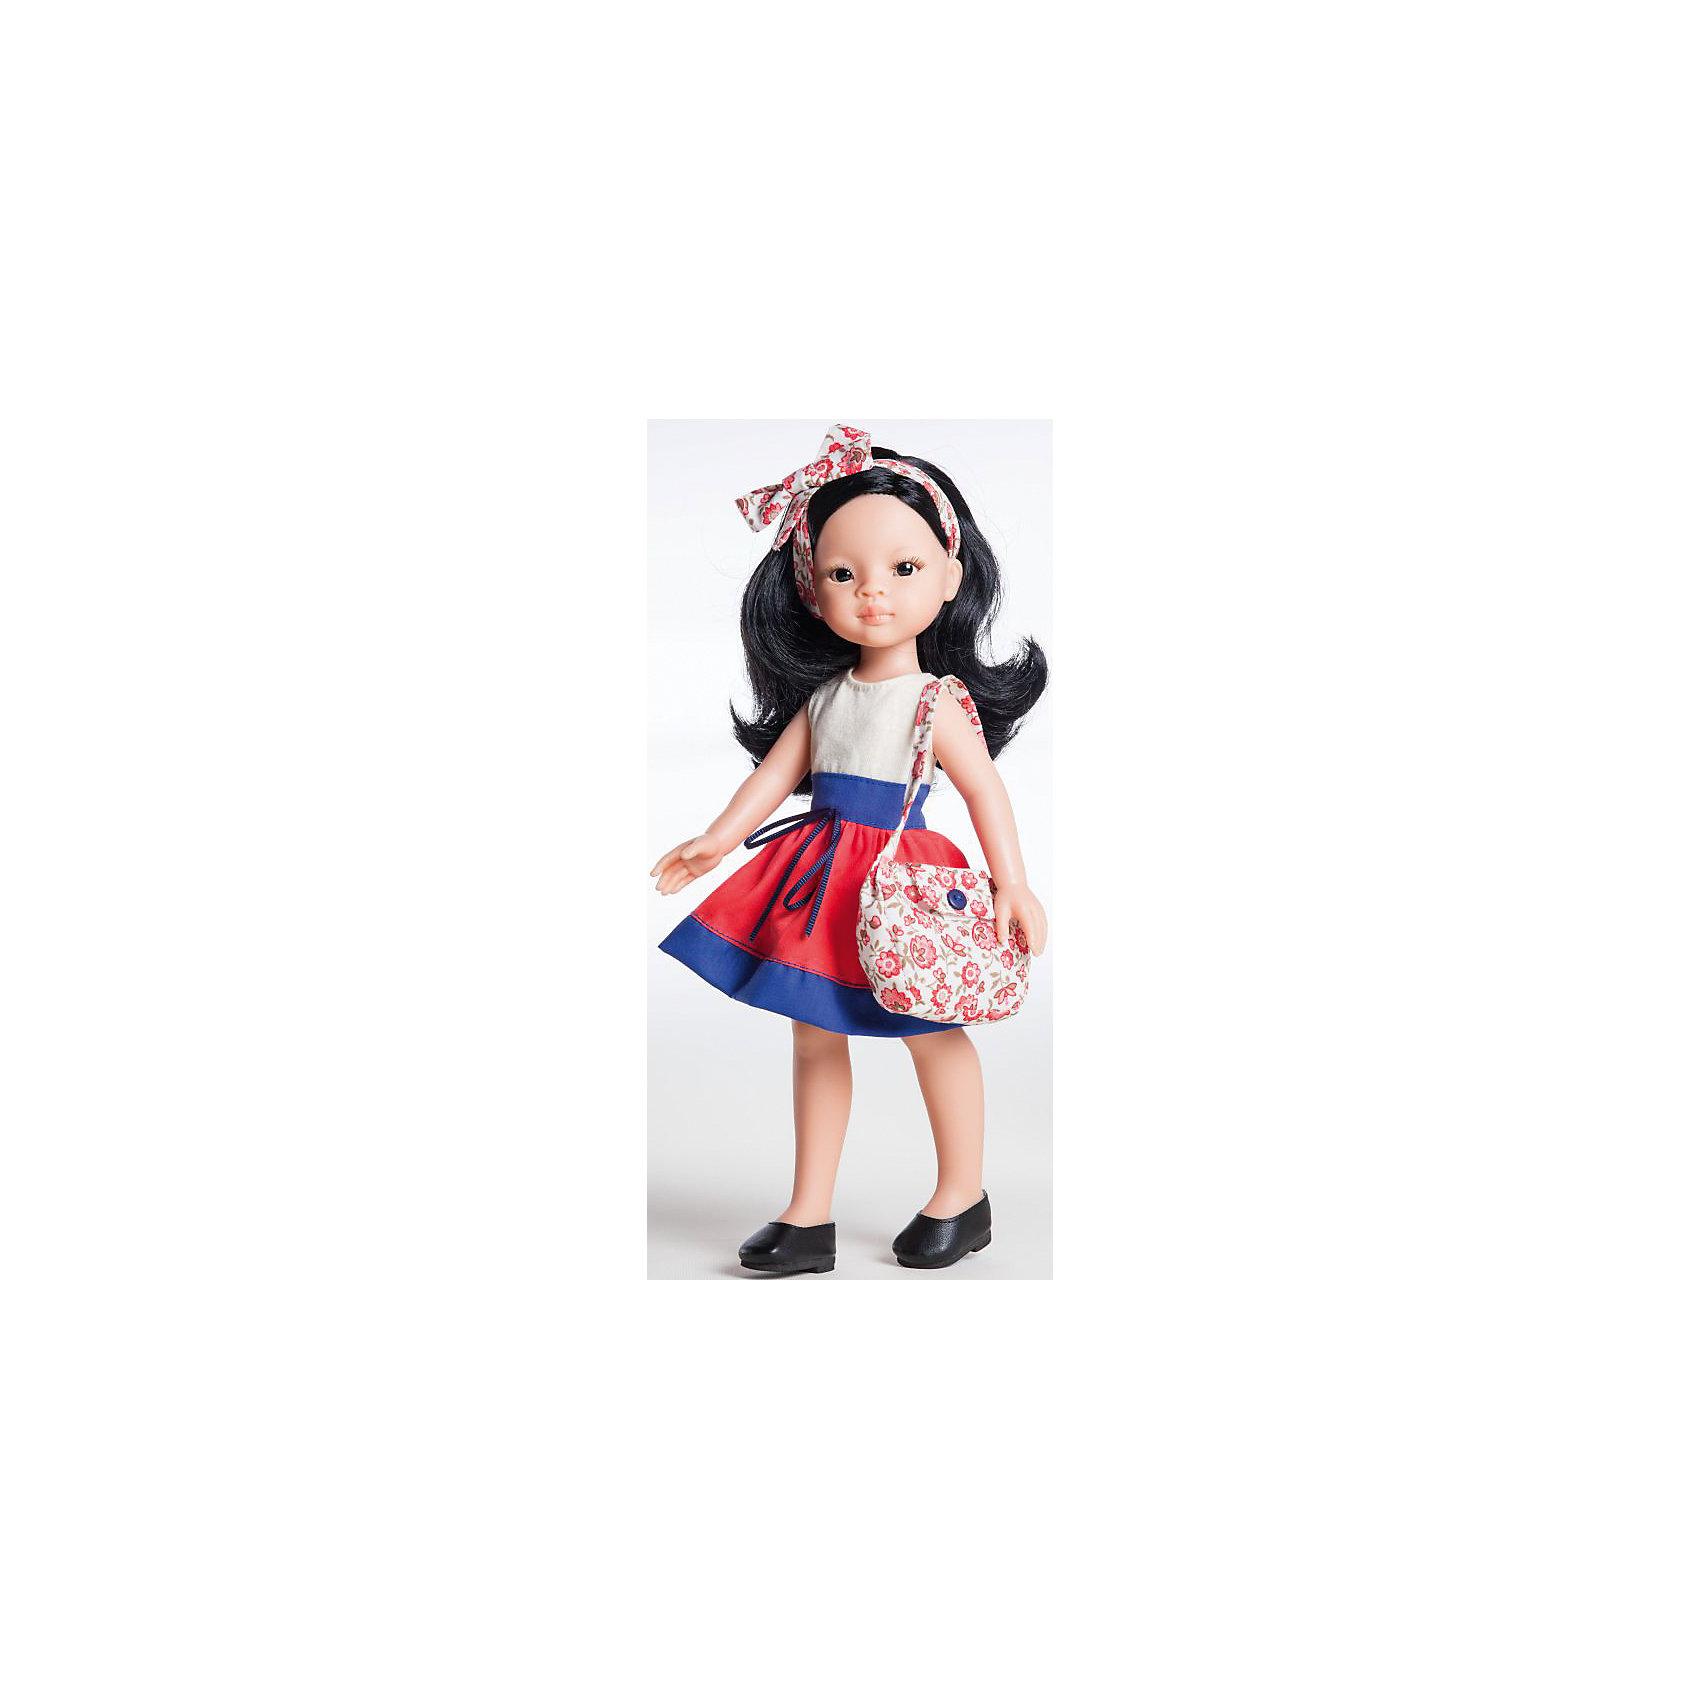 Paola Reina Кукла Лиу, 32 см, Paola Reina paola reina кукла клэр 32 см paola reina